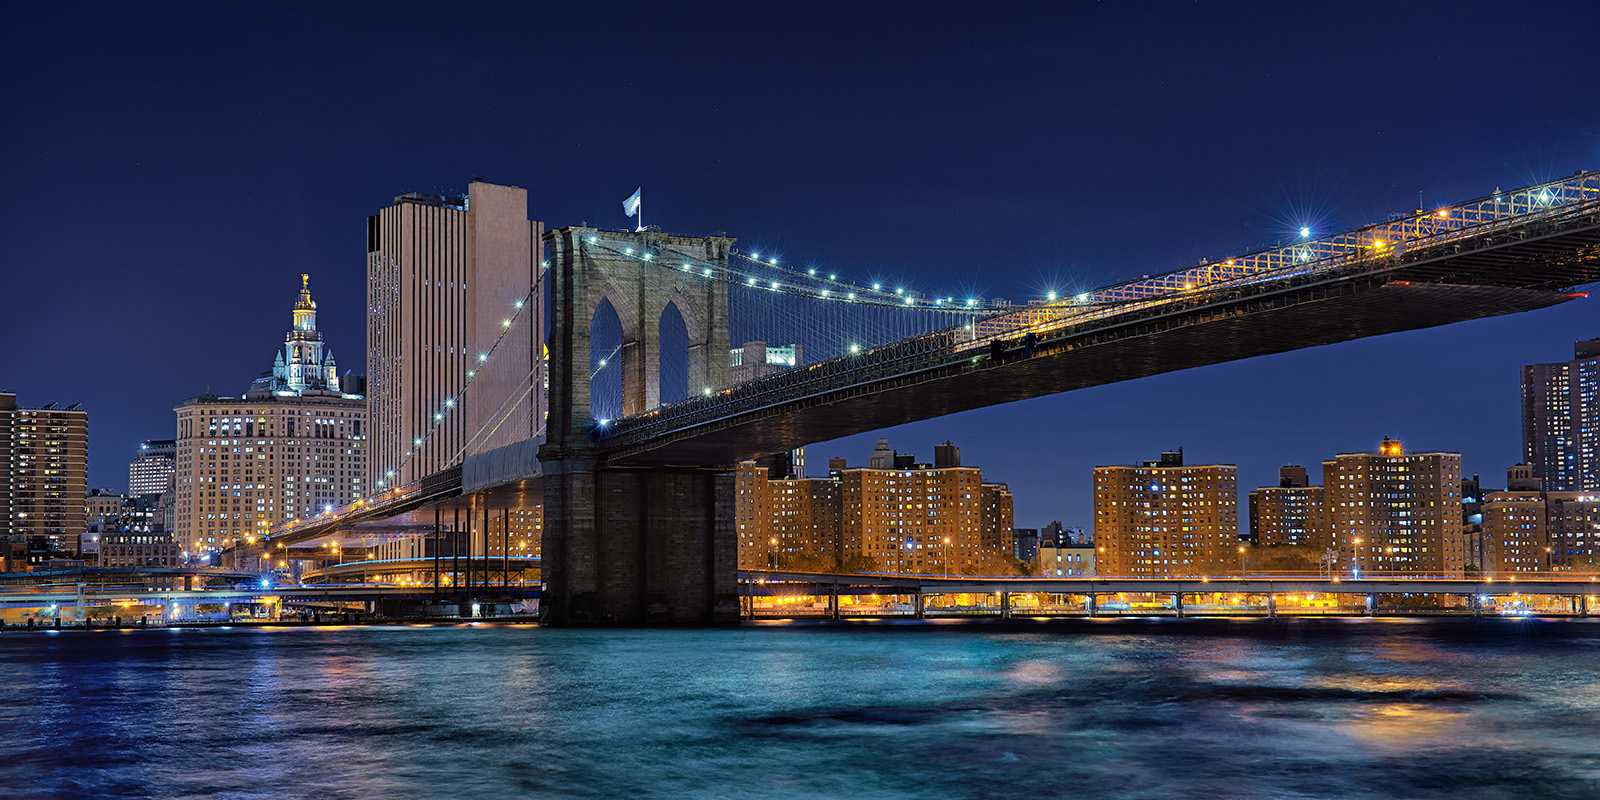 Brooklyn Bridge mot Manhattan på kvelden av Peder Aaserud Eikeland